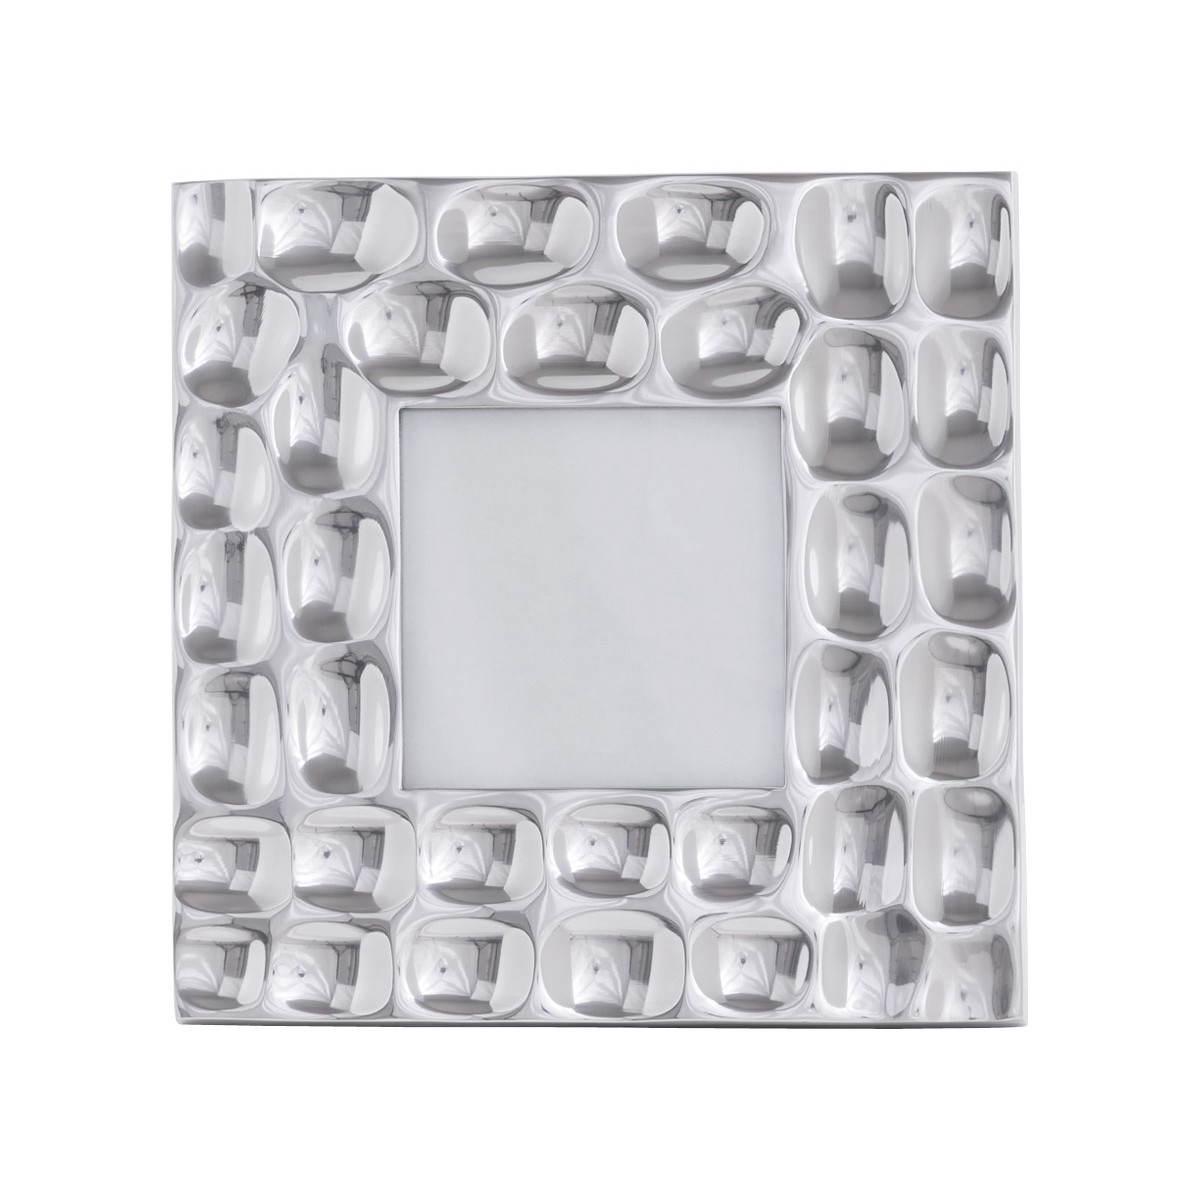 Photo frame large format martel in aluminium aluminum - Cadre photo grand format ikea ...